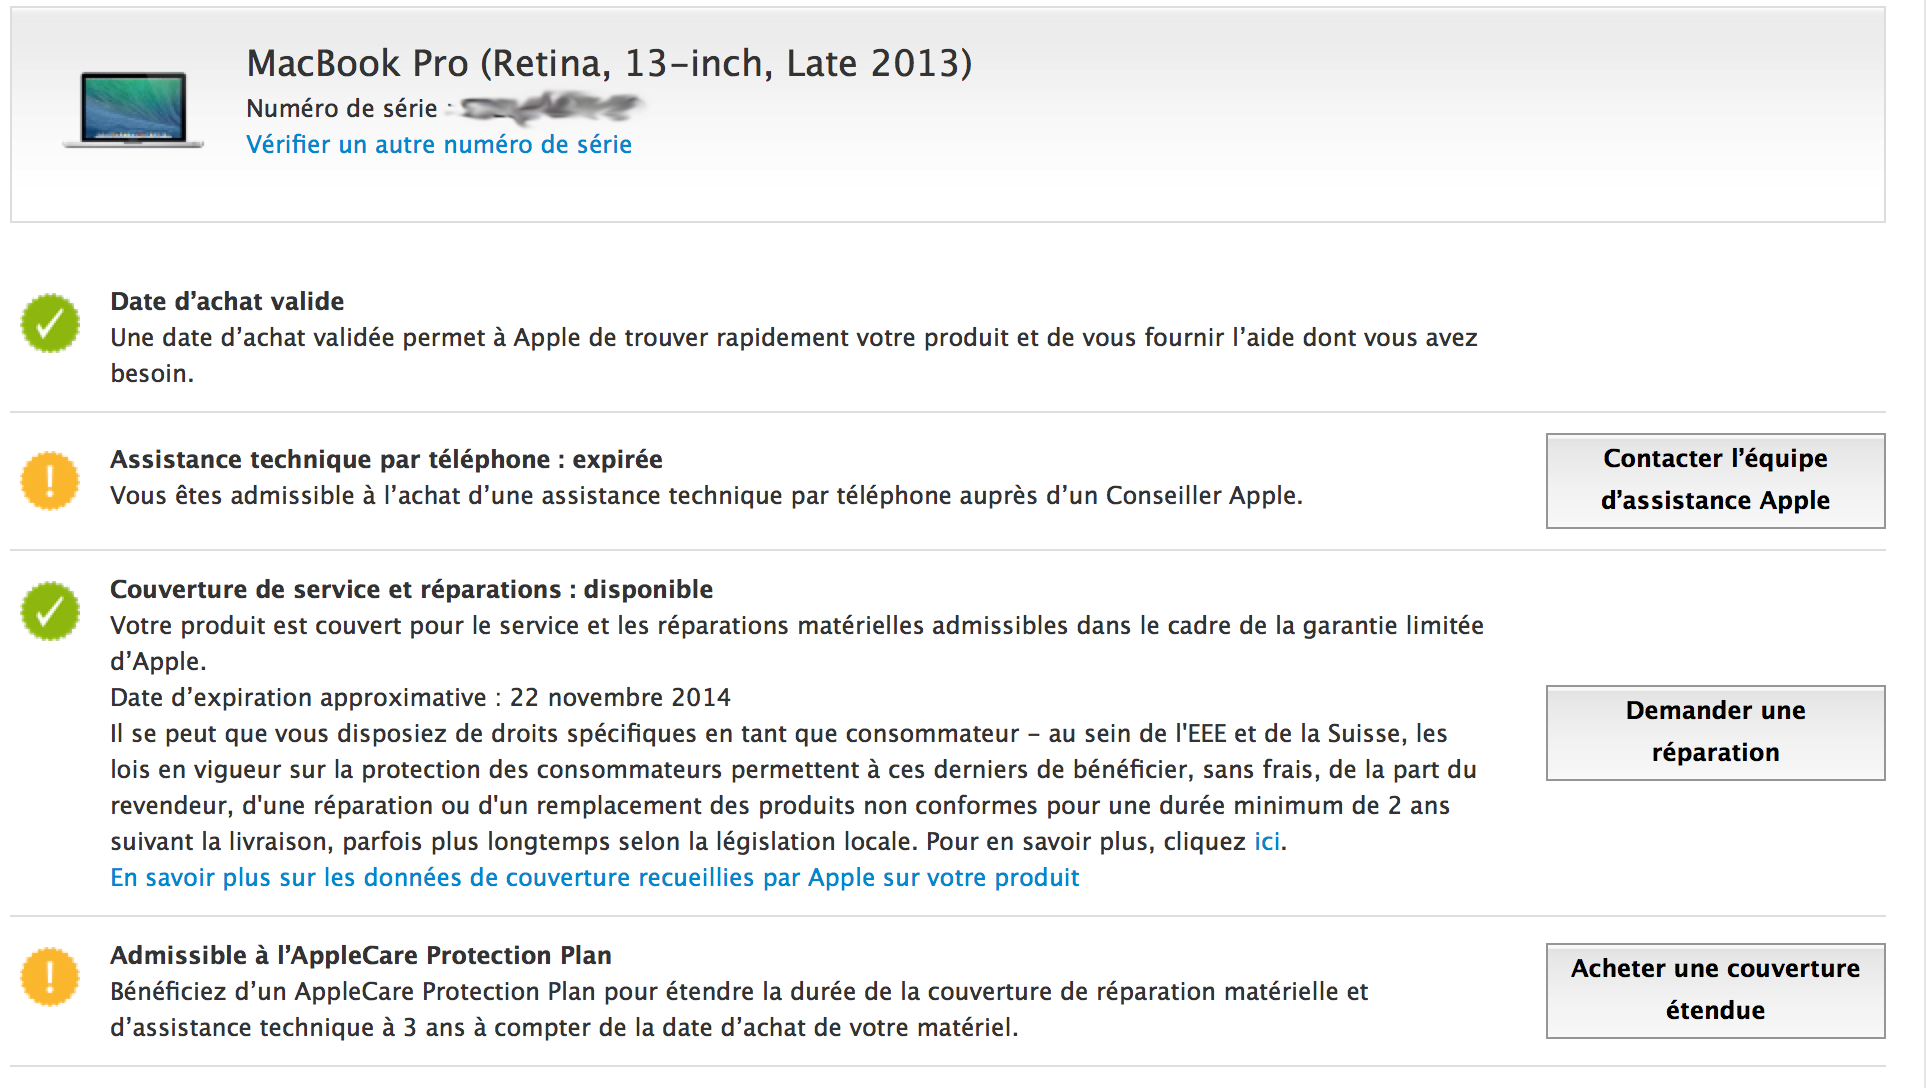 http://pluchke.free.fr/ventes/retina2.png